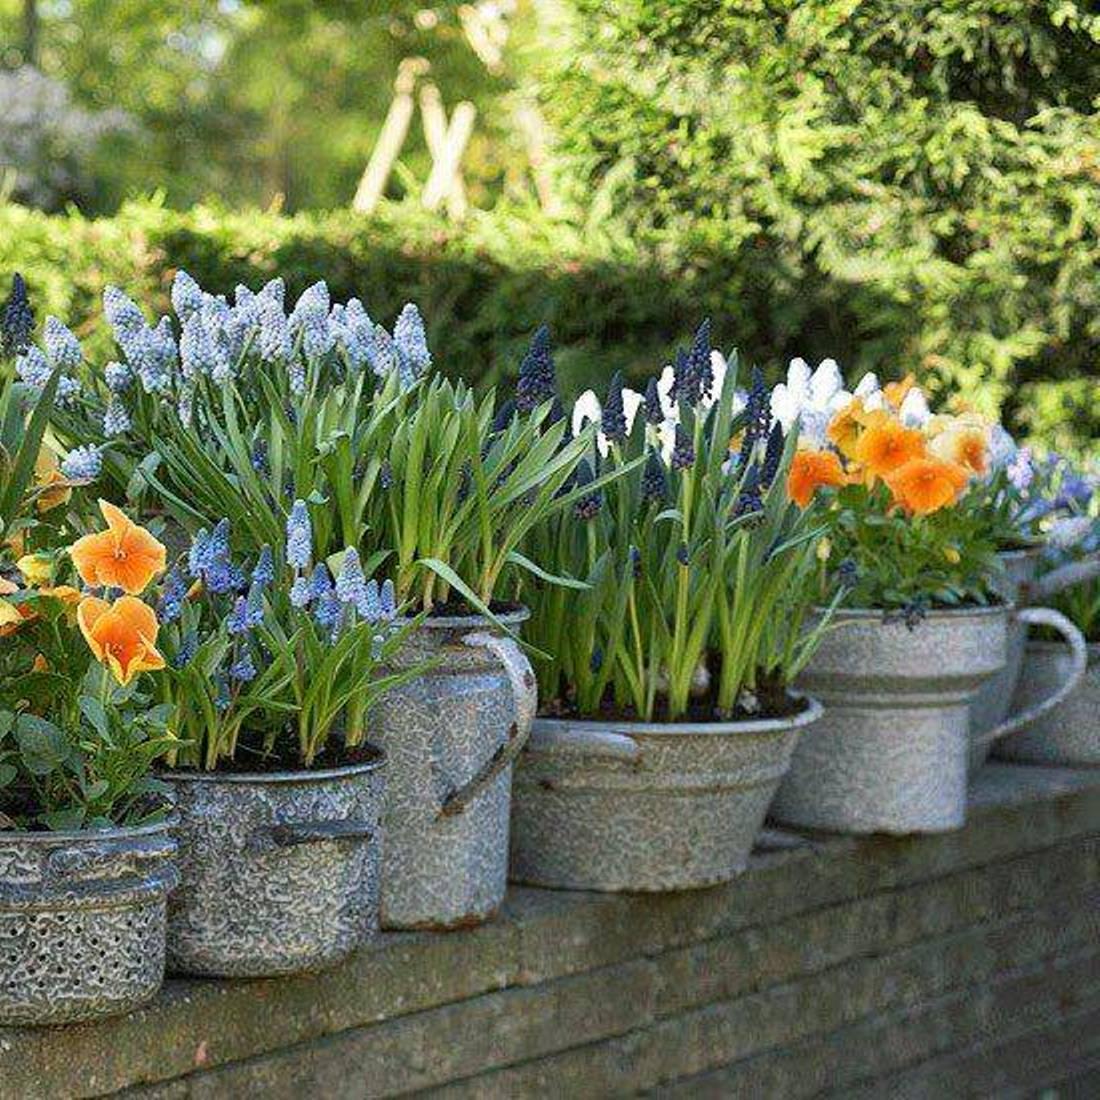 Small Flower Bed Ideas Saveemail Joanne Winn Garden Design 17